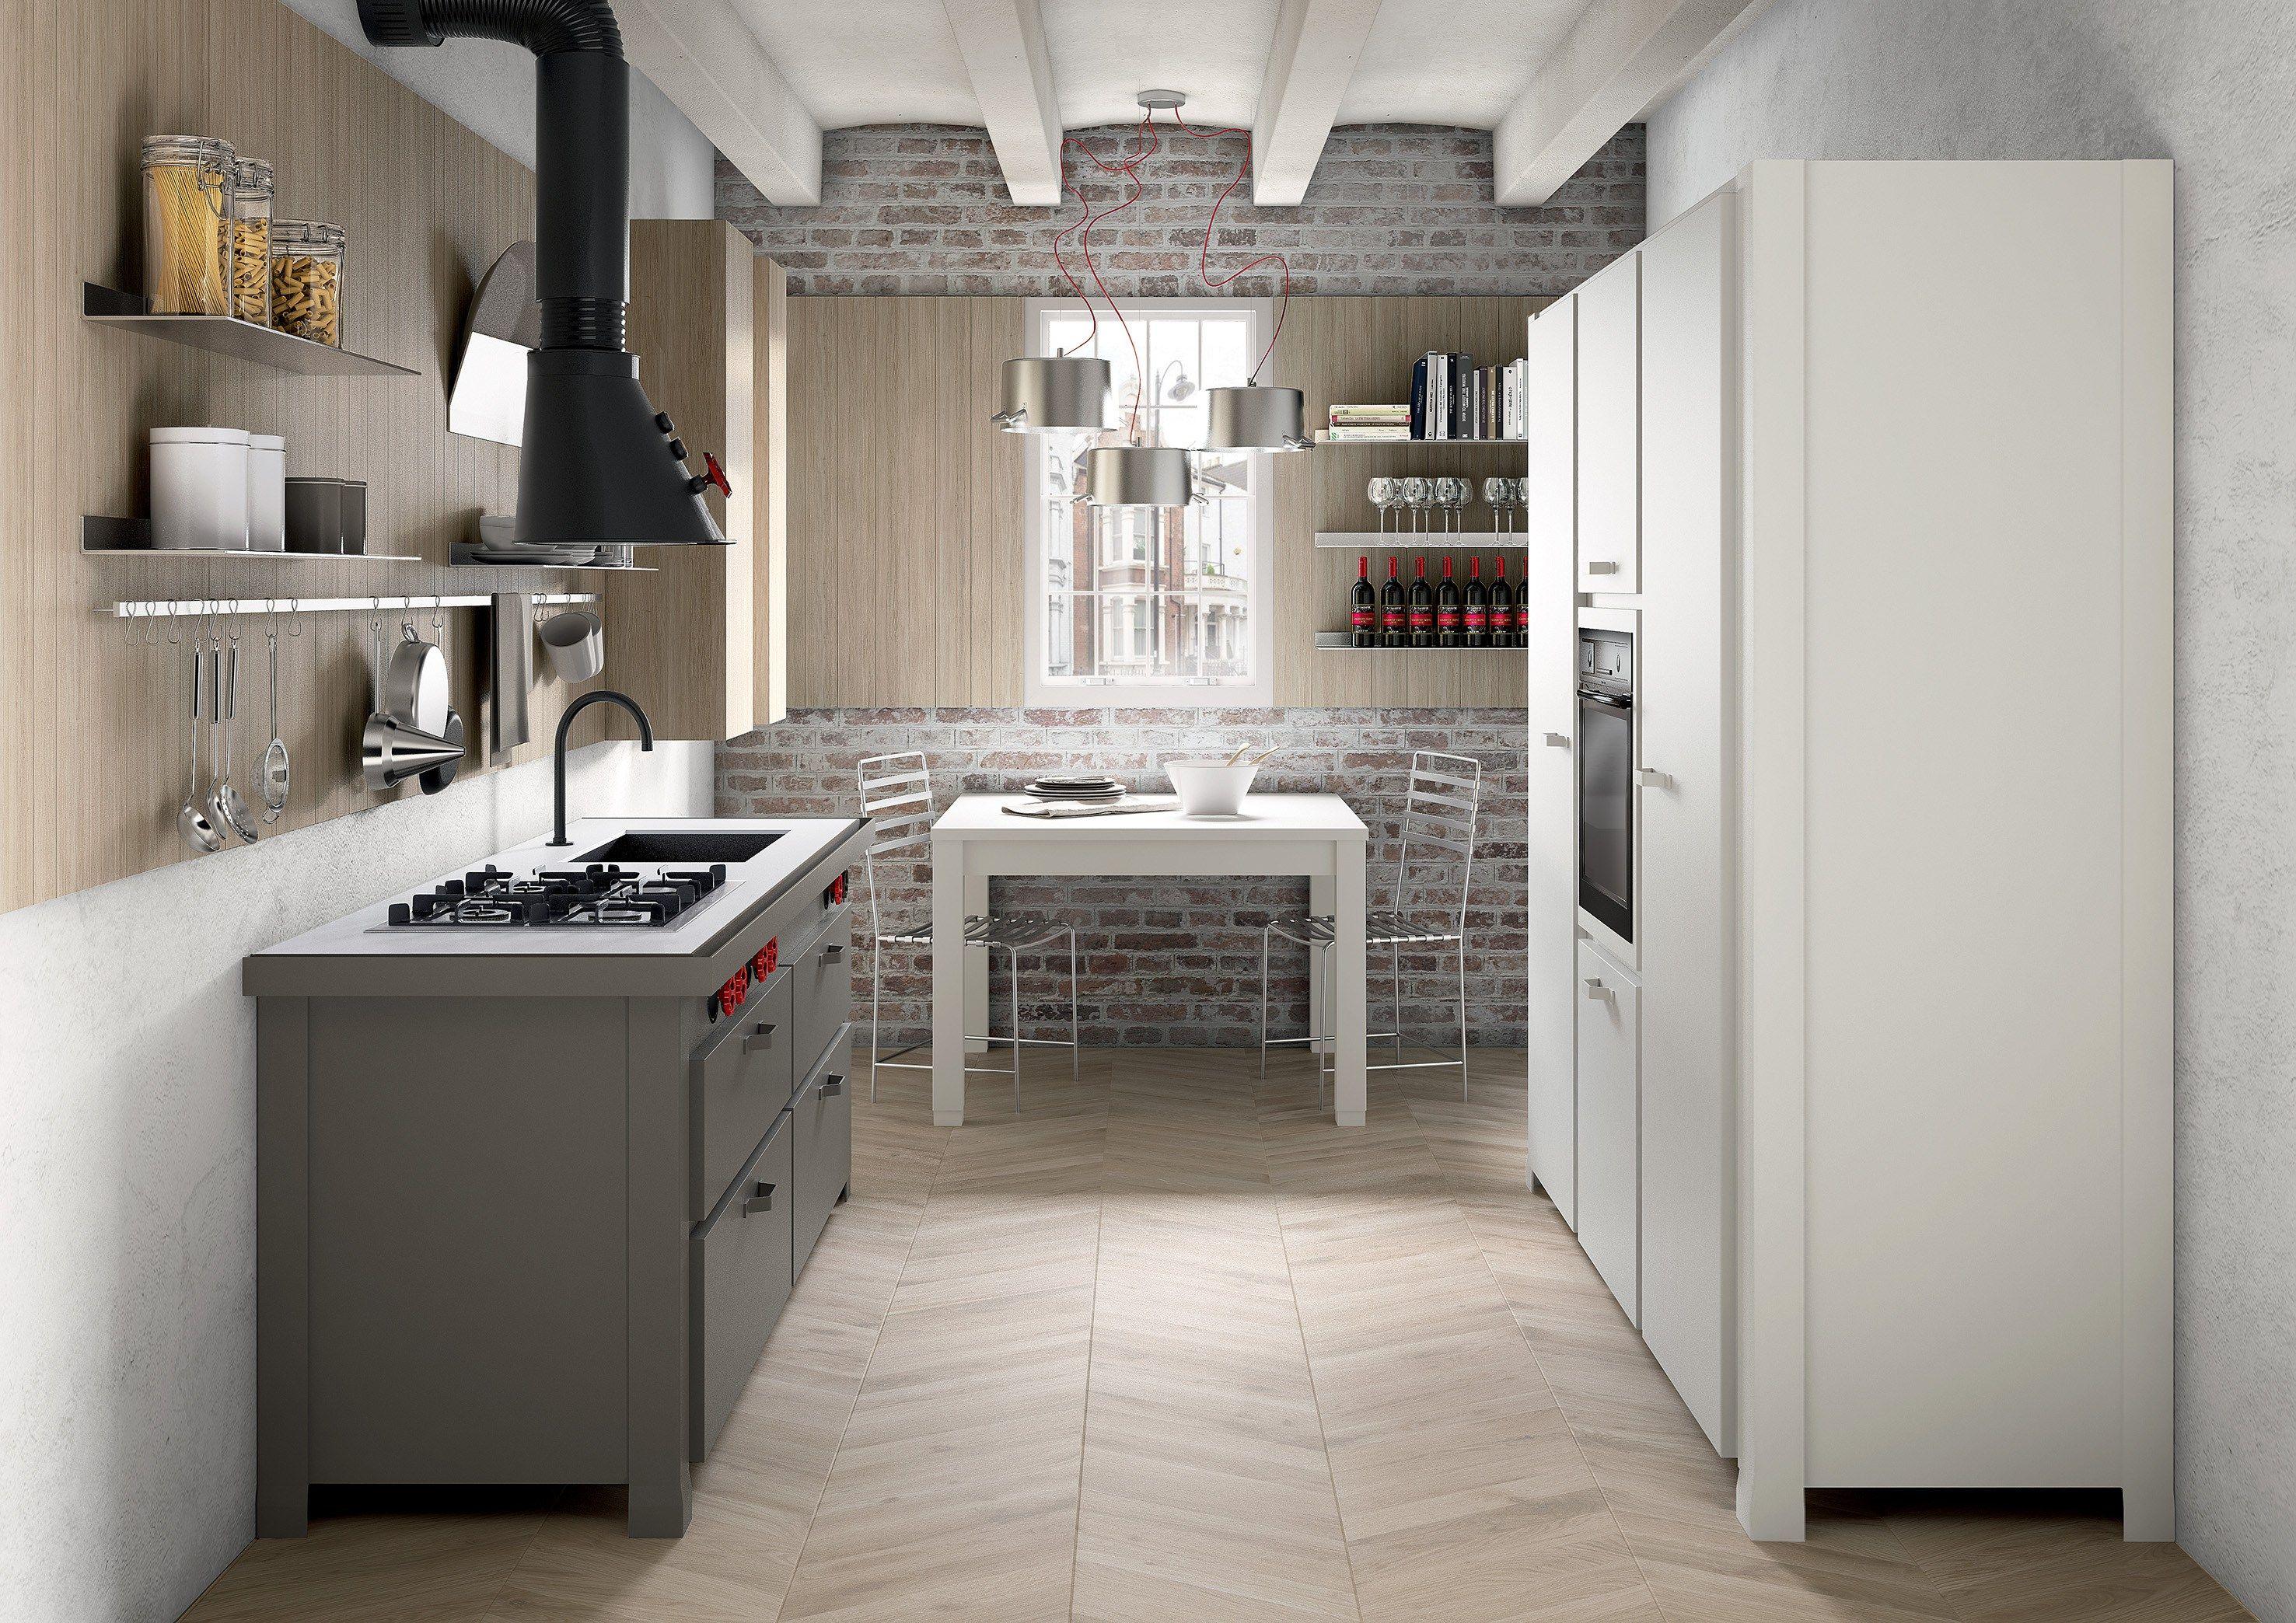 Cappe Cucina Design. Perfect Ellittica With Cappe Cucina Design ...